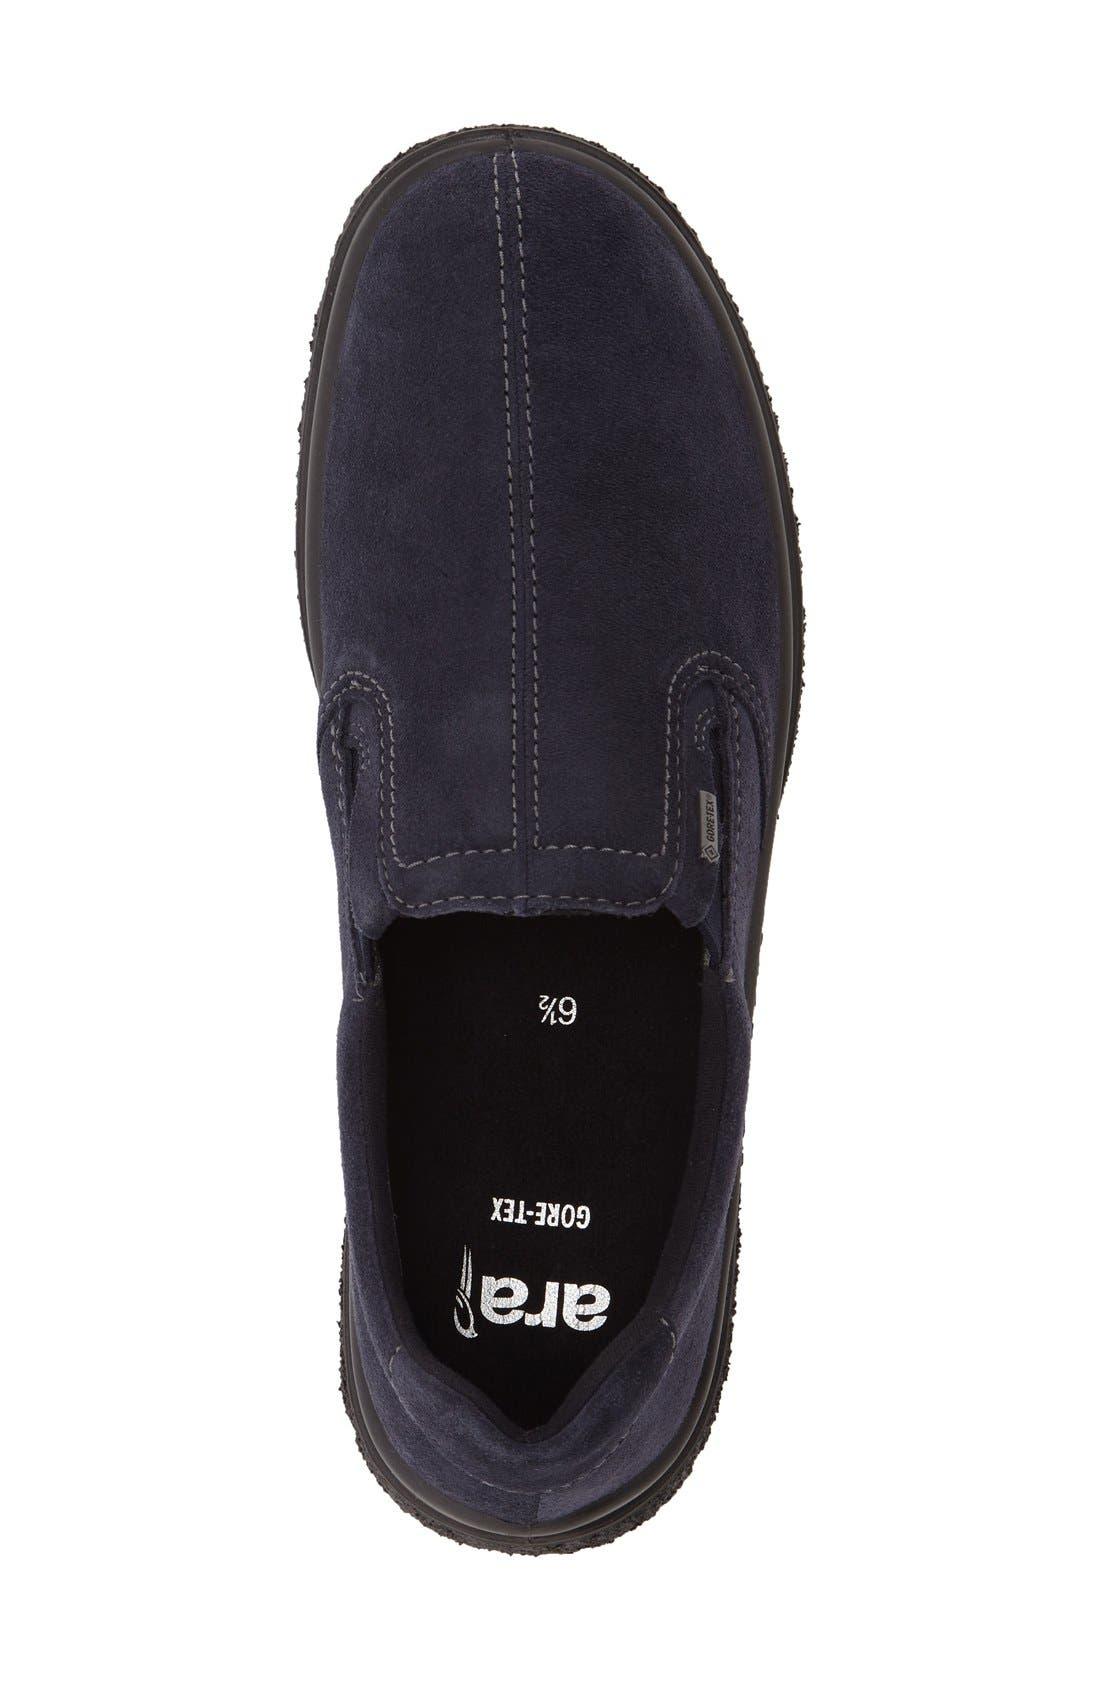 Parson Waterproof Gore-Tex<sup>®</sup> Slip-On Sneaker,                             Alternate thumbnail 3, color,                             NAVY SUEDE